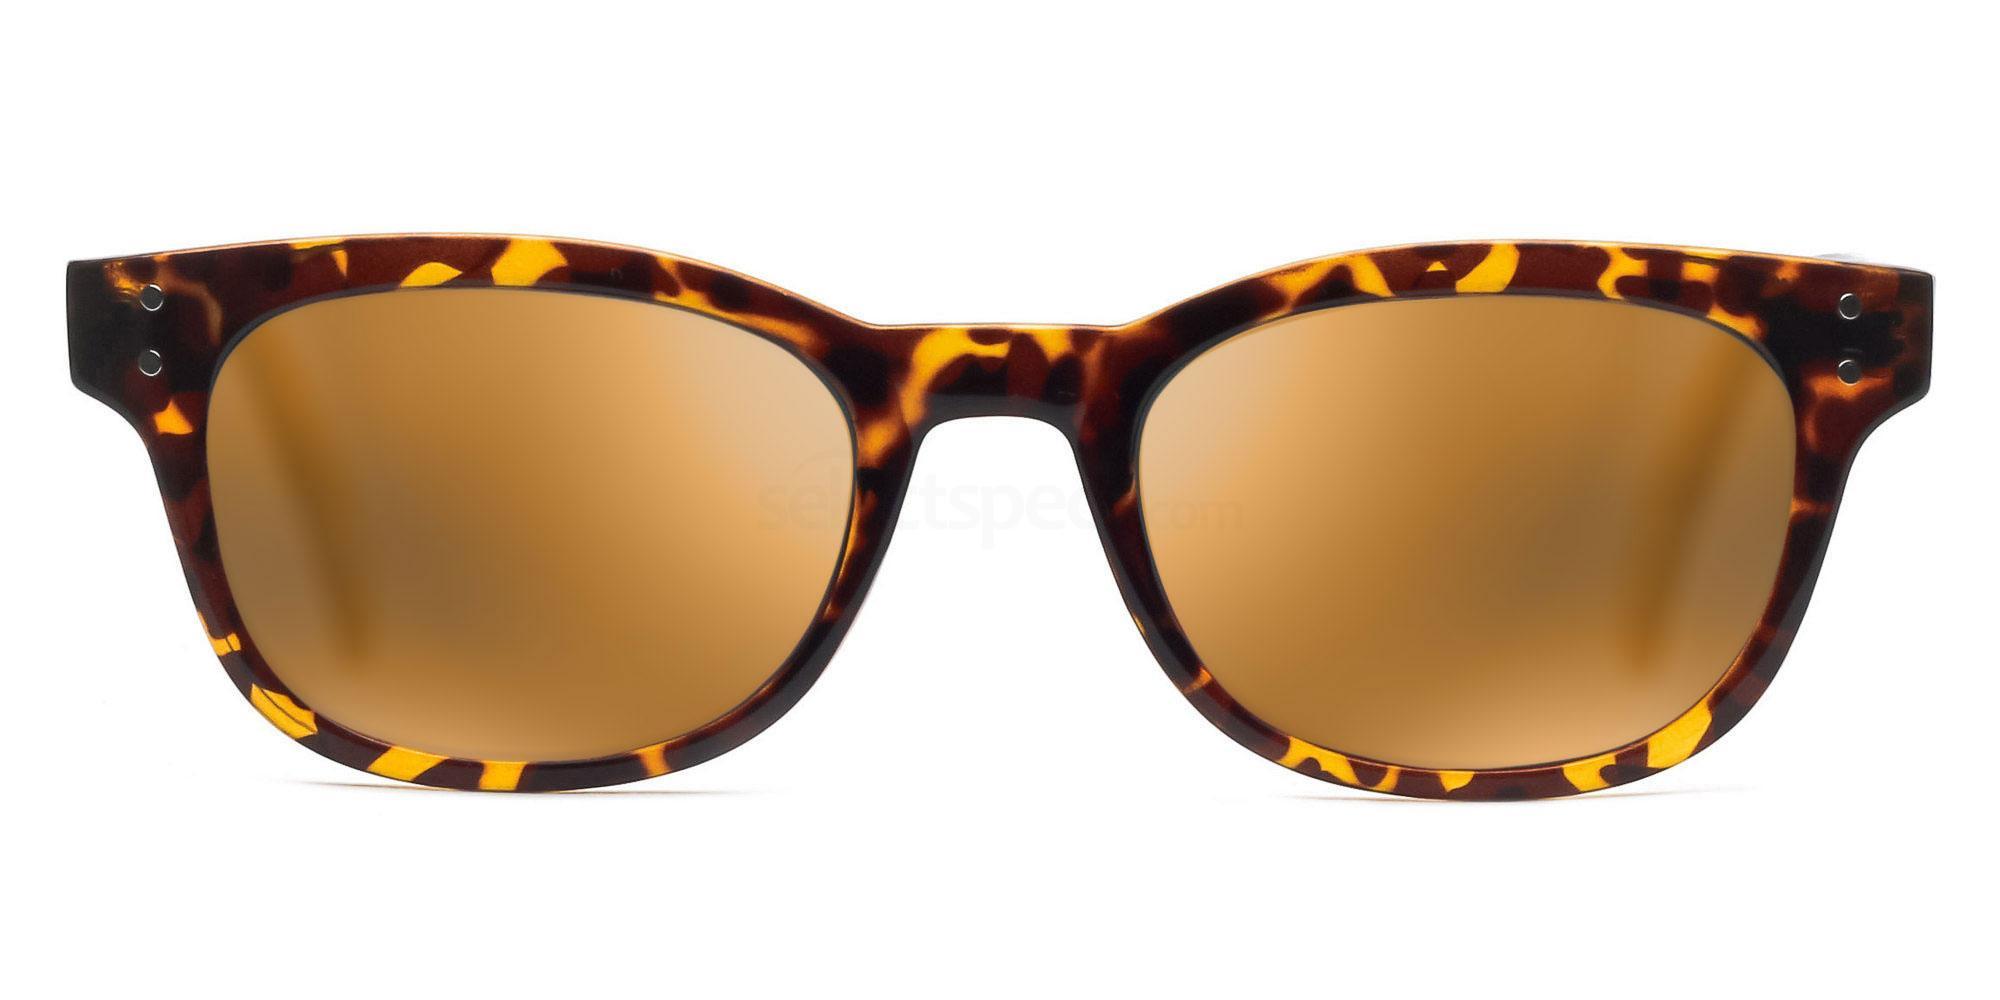 C04 Polarized Grey with Orange Mirror P2249 Havana (Mirrored Polarized) Sunglasses, Savannah